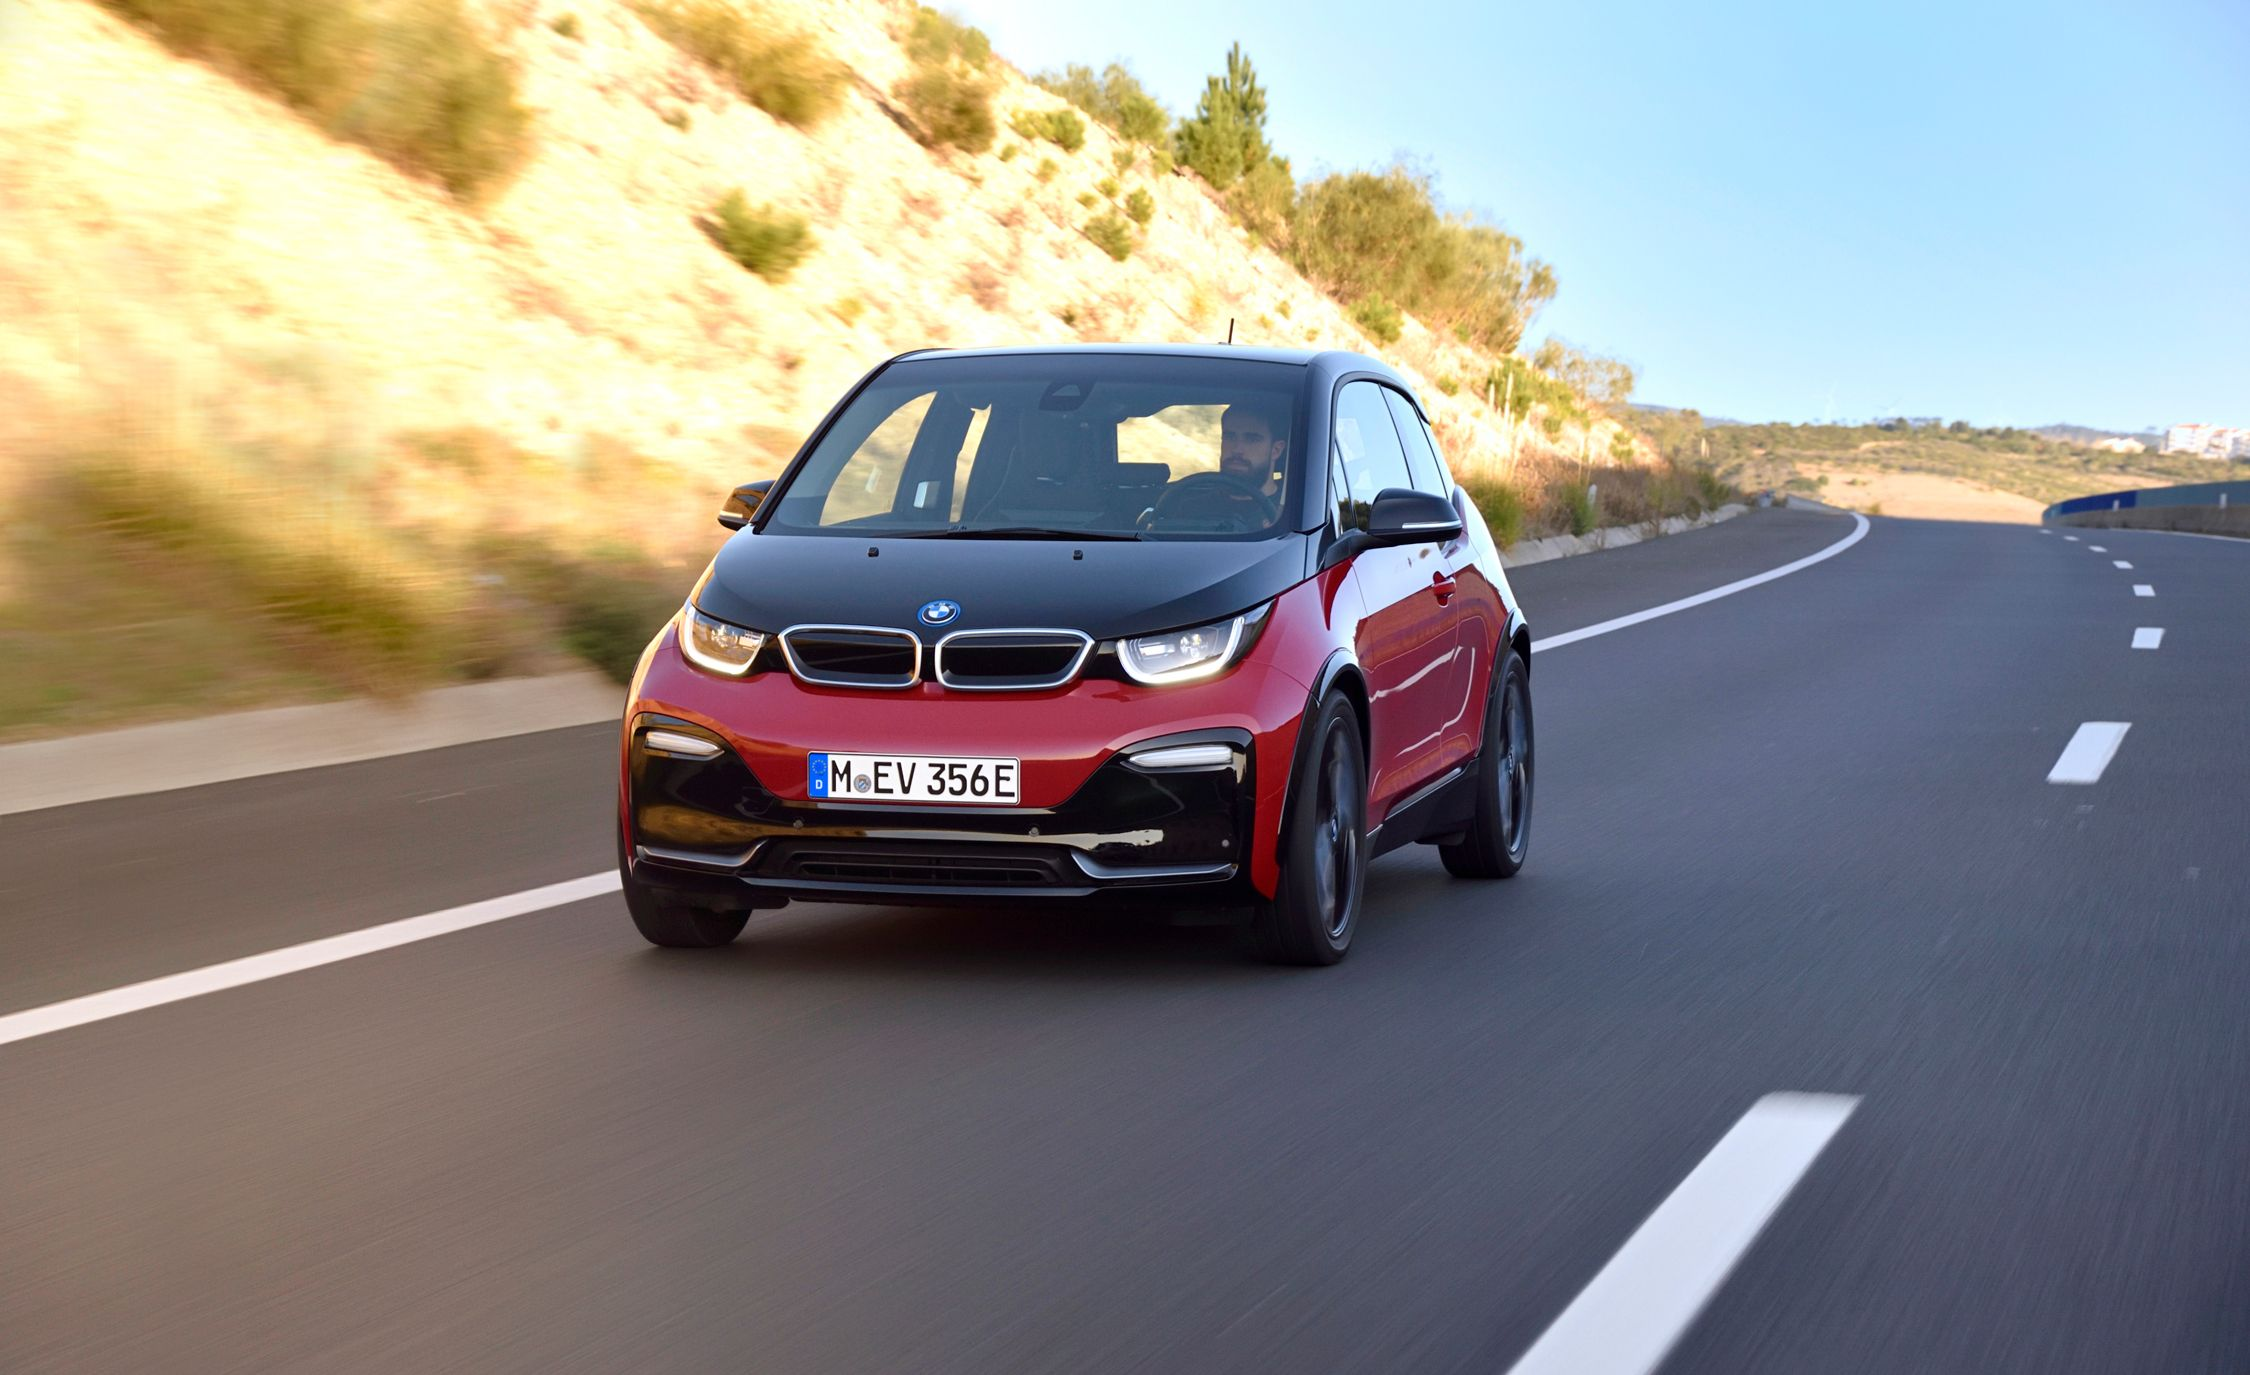 2019 Bmw I3 Reviews Bmw I3 Price Photos And Specs Car And Driver